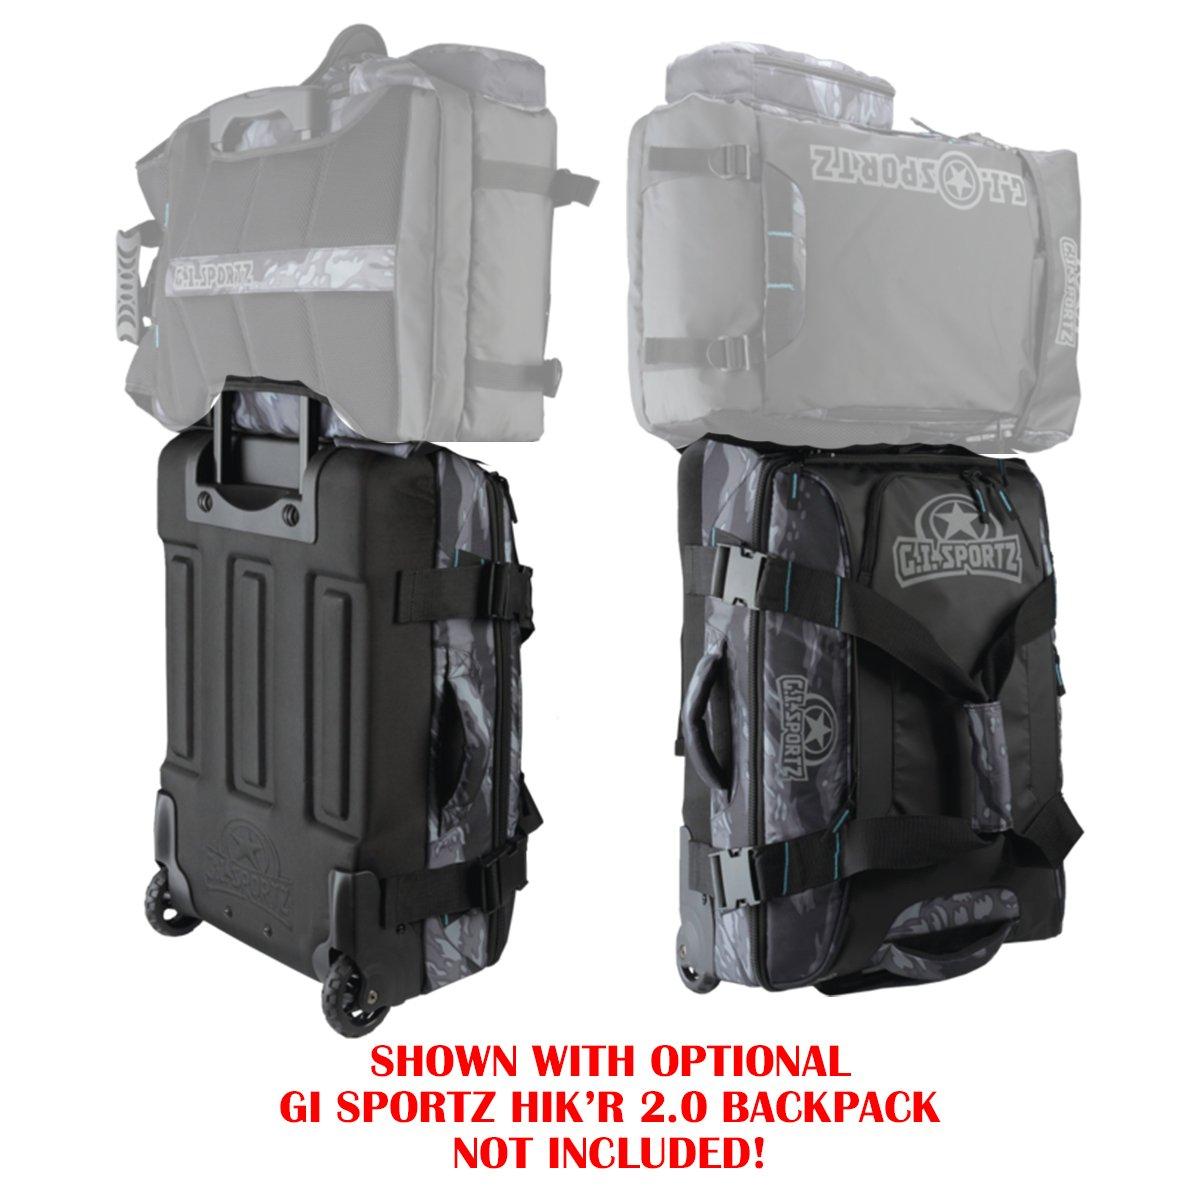 GI Sportz Paintball FLY'R 2.0 Carry On Gear Bag - Tiger Black by GI Sportz (Image #4)